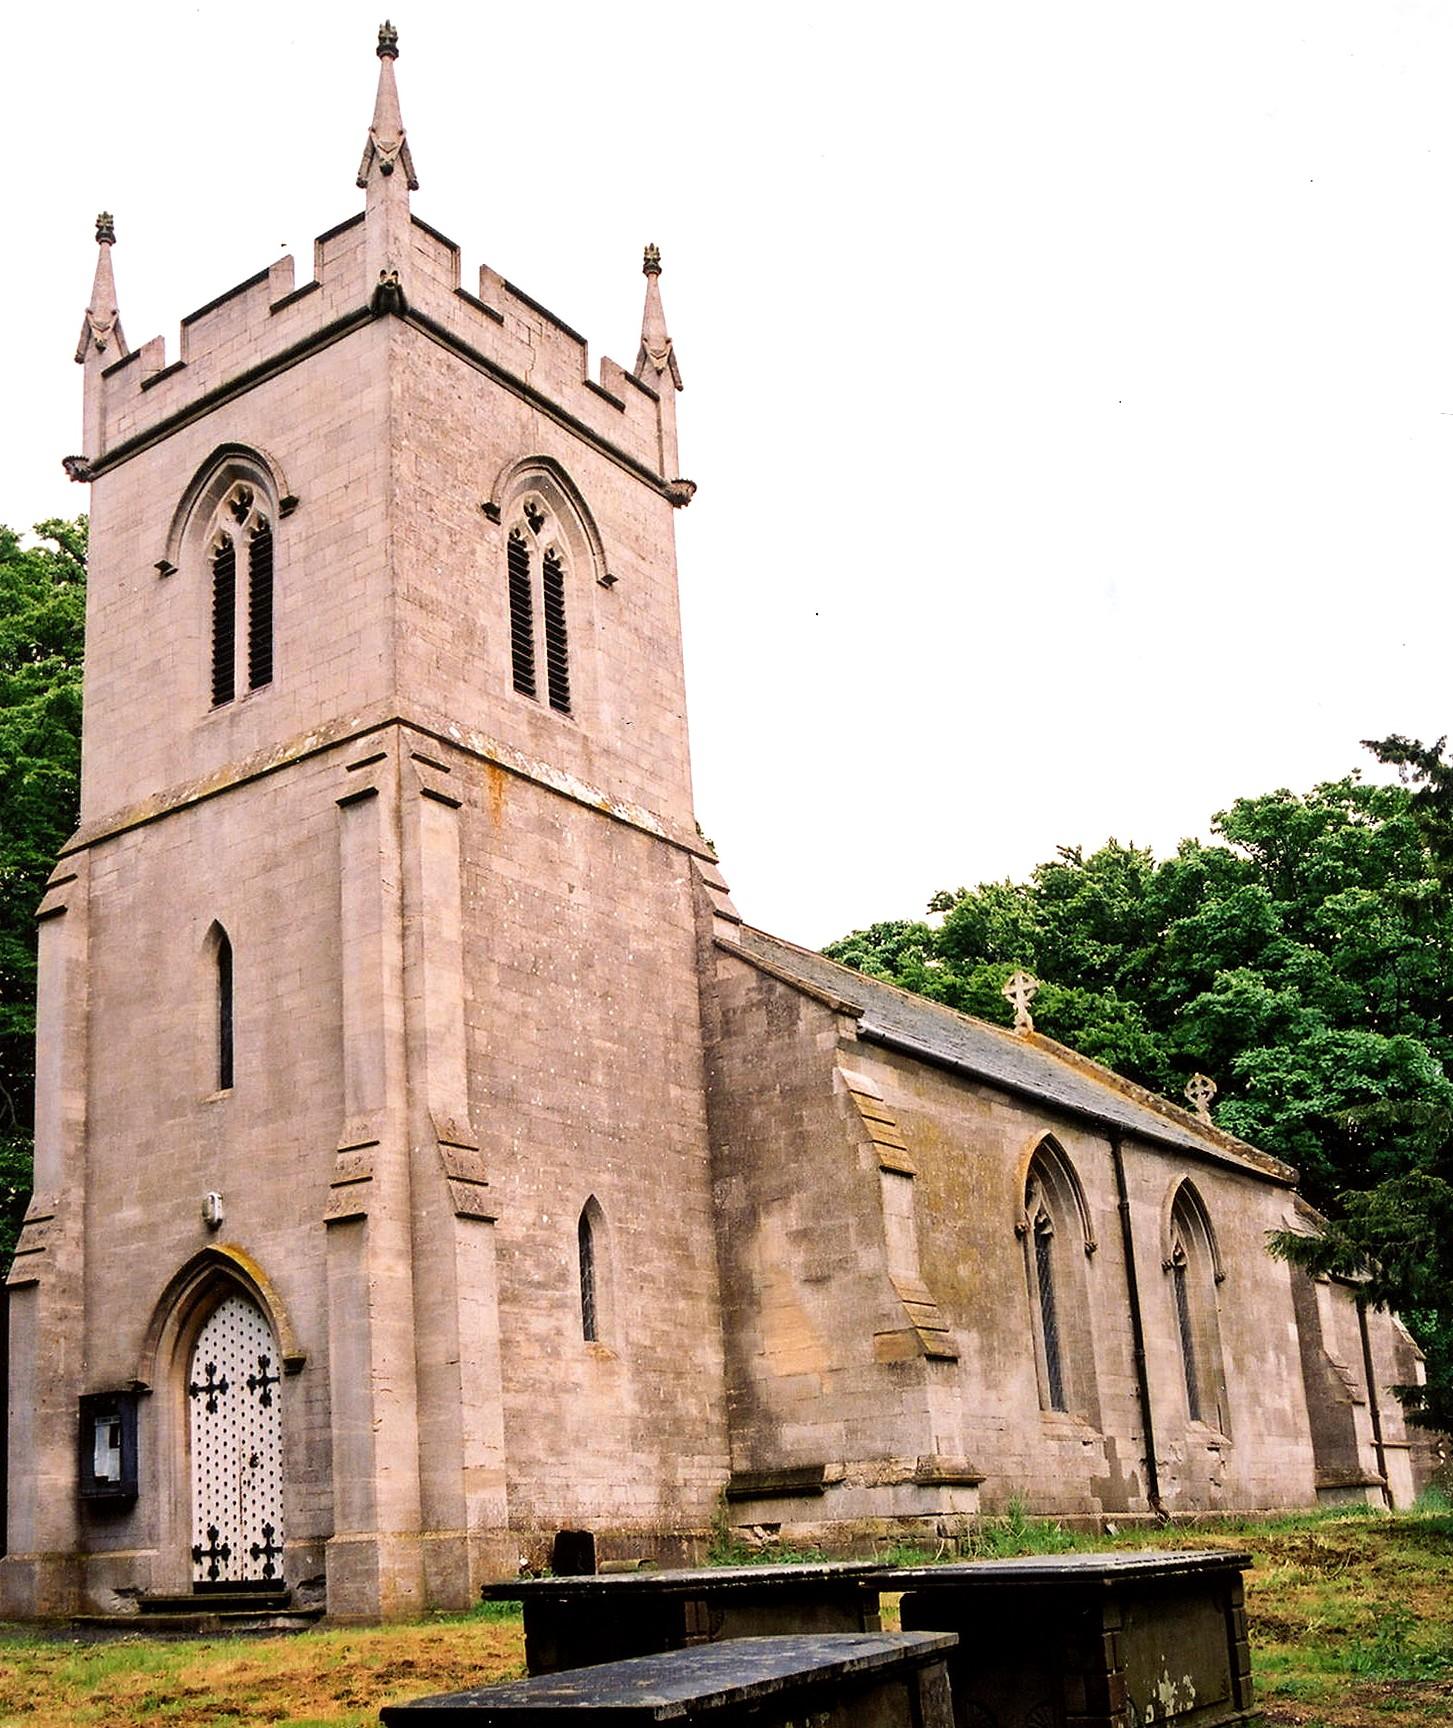 St German's church